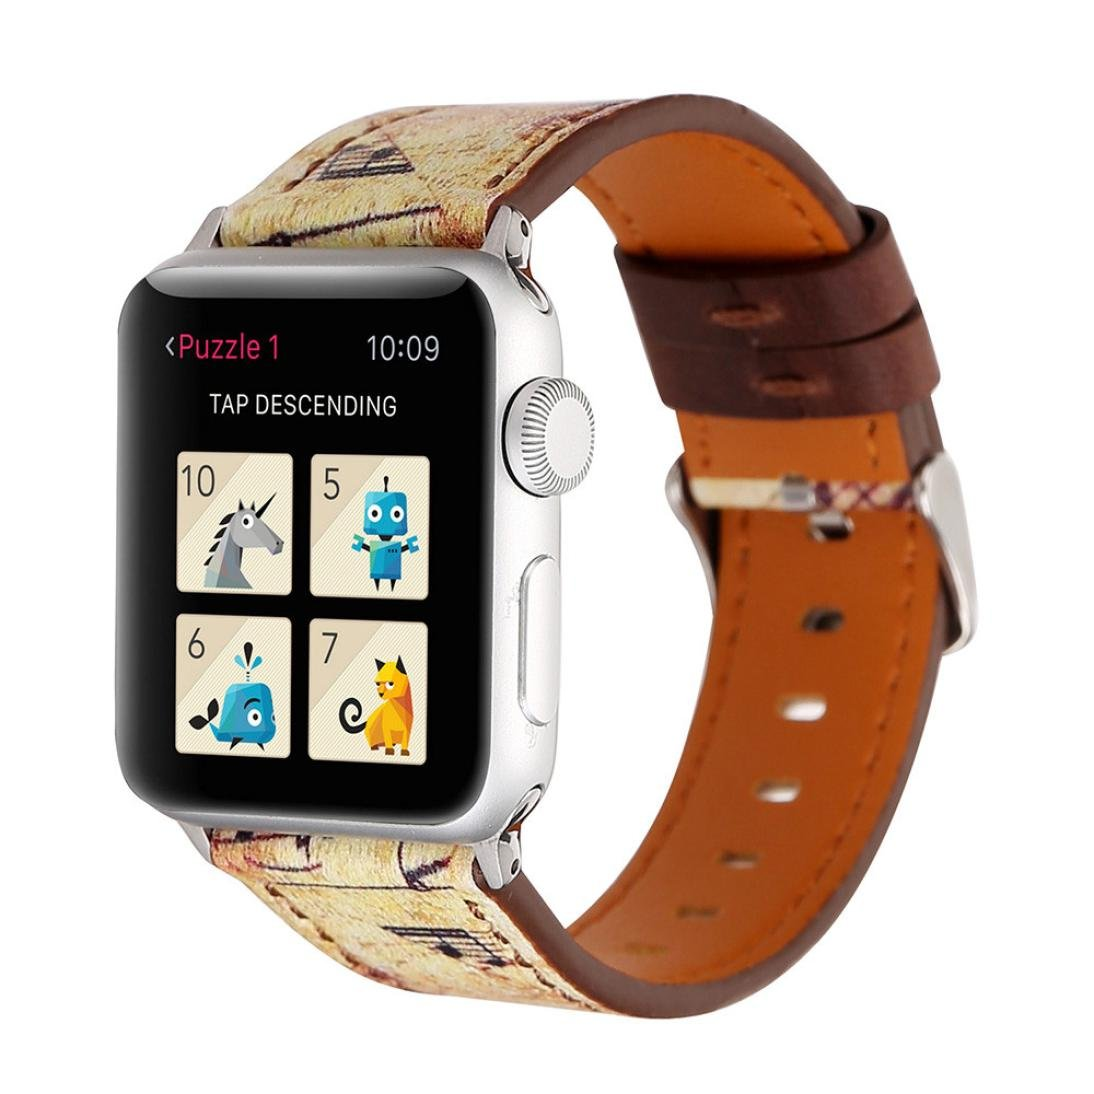 For Apple Watchバンド38 mm、ヴィンテージ花音楽NOTE Chopレトロスタイルレザーストラップバンド交換リストバンドApple腕時計ブレスレットアクセサリー C C B078ZXN38G